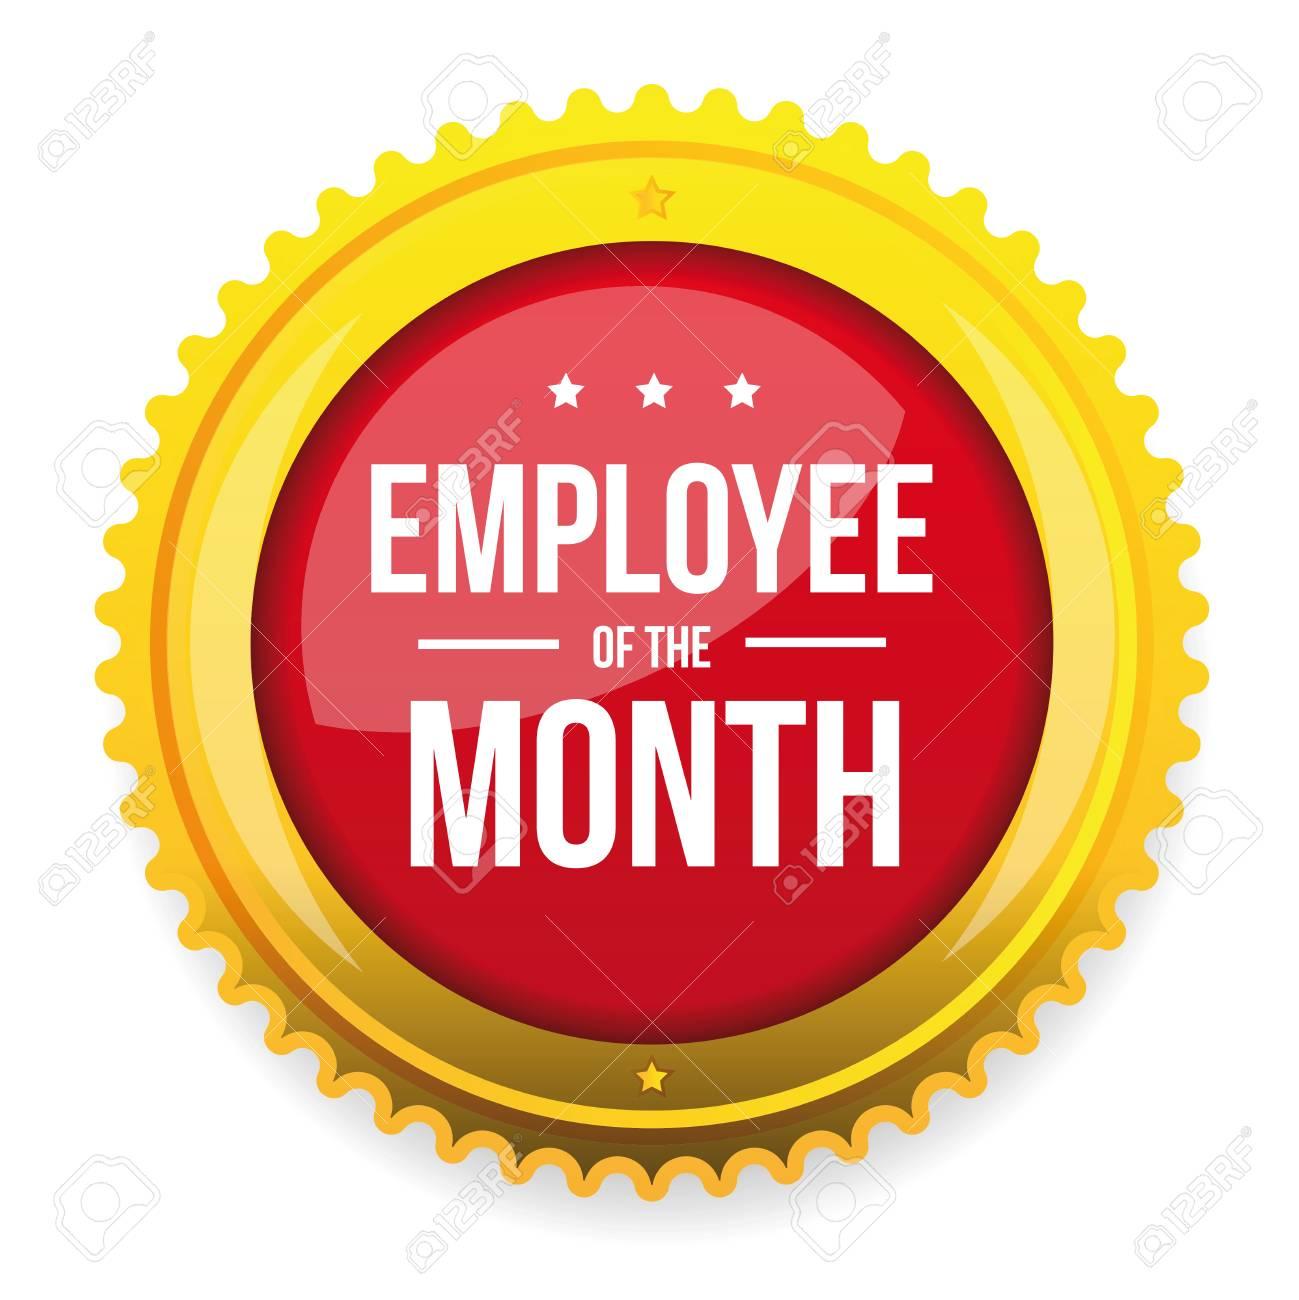 previews123rfcomimagespetrnutilpetrnutil1708 - Employee Of The Month Award